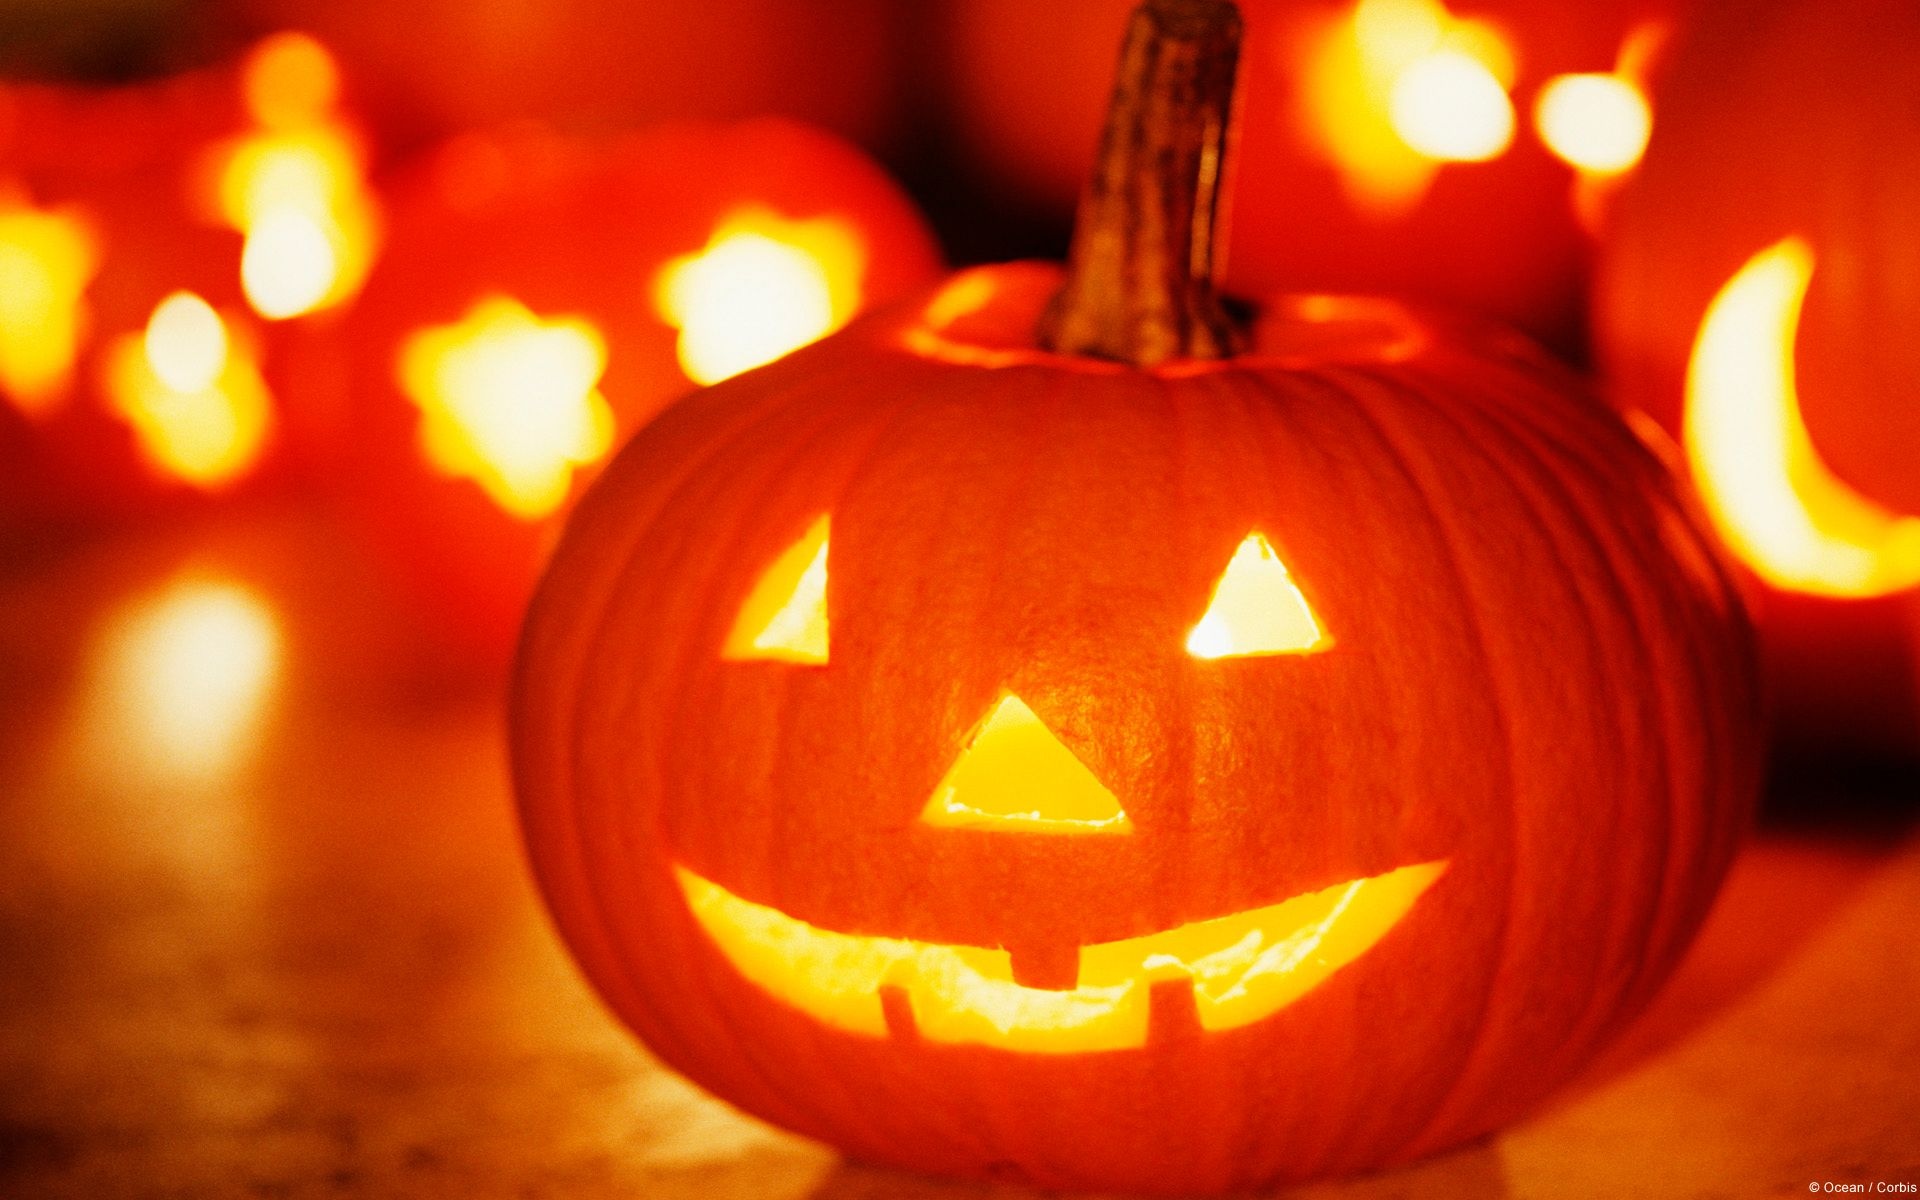 Pin By Her Campus Mt Holyoke On Halloween Halloween Jack O Lanterns Pumpkin Carving Pumpkin